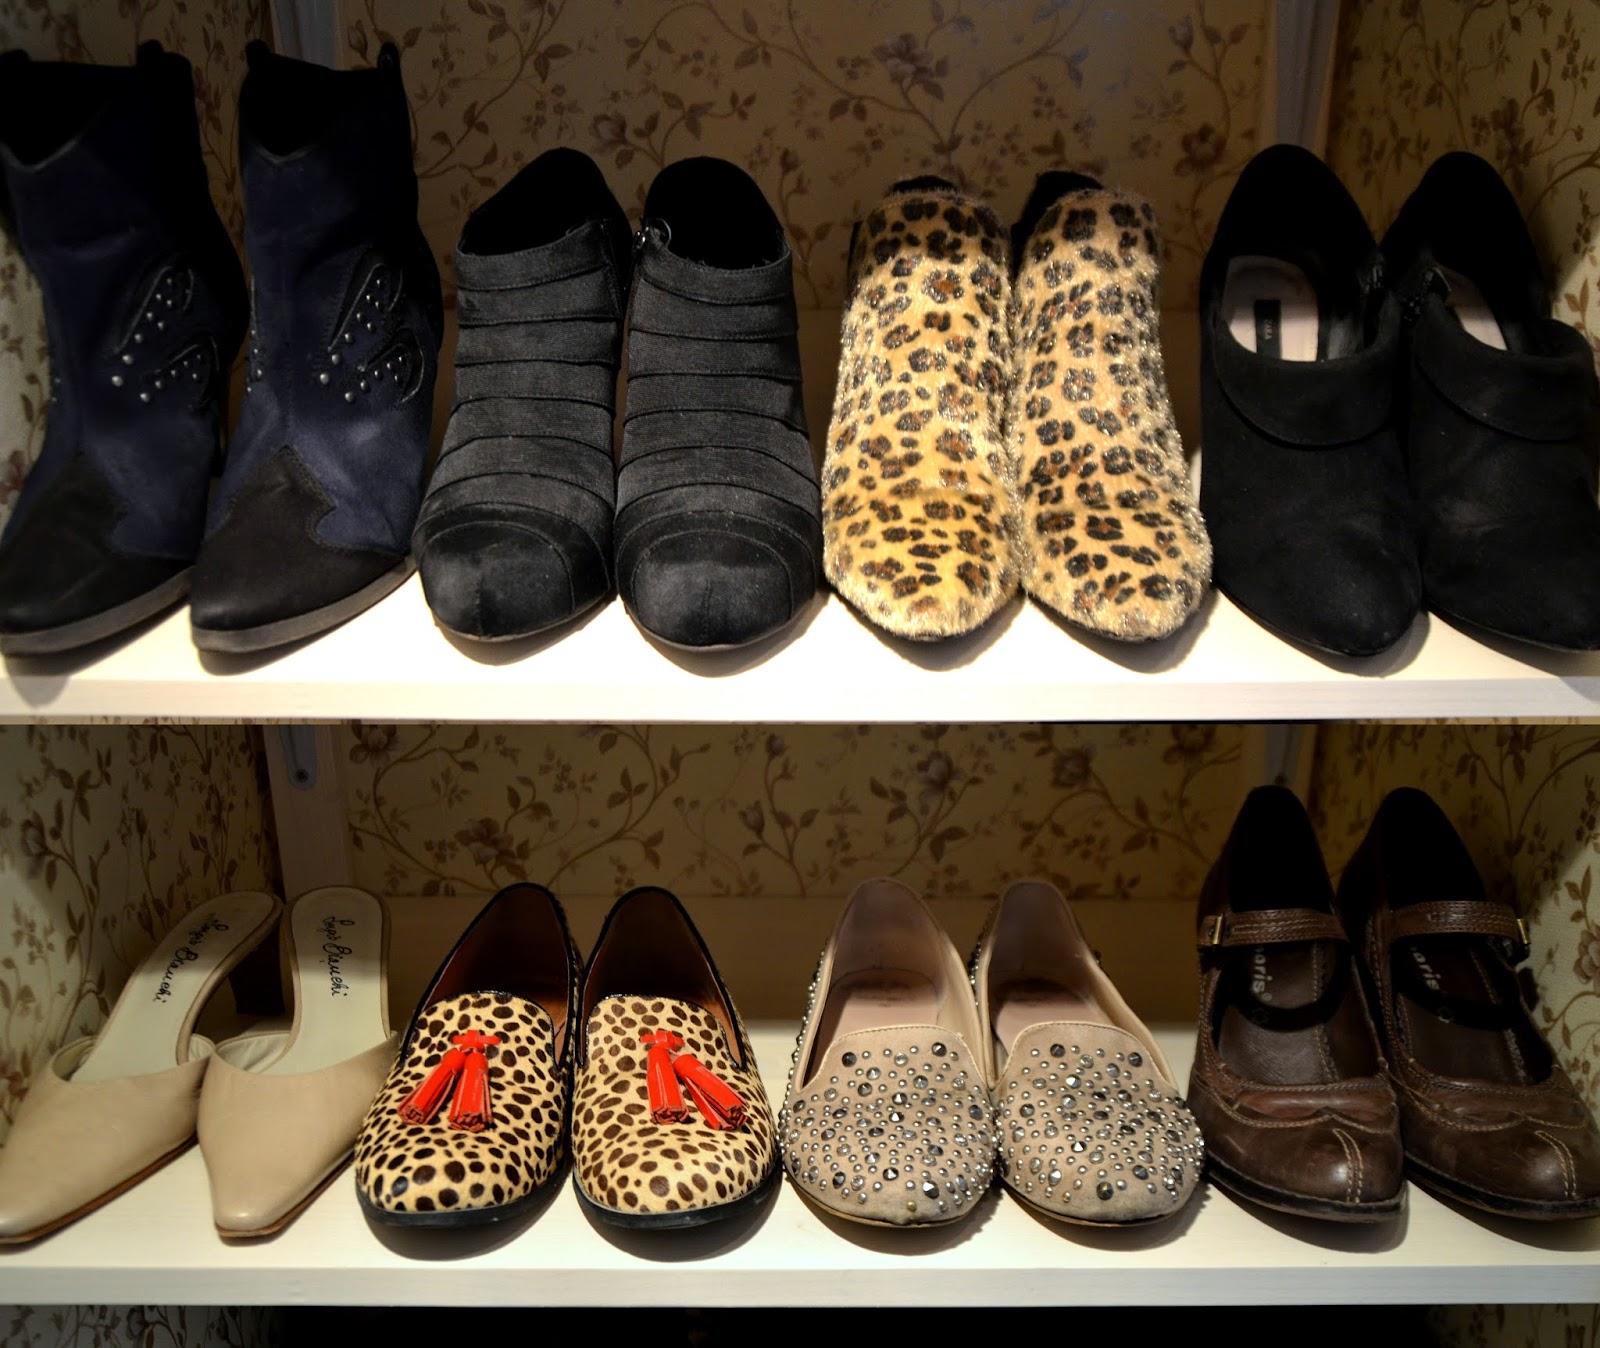 shoe closet flats slippers boots leopard